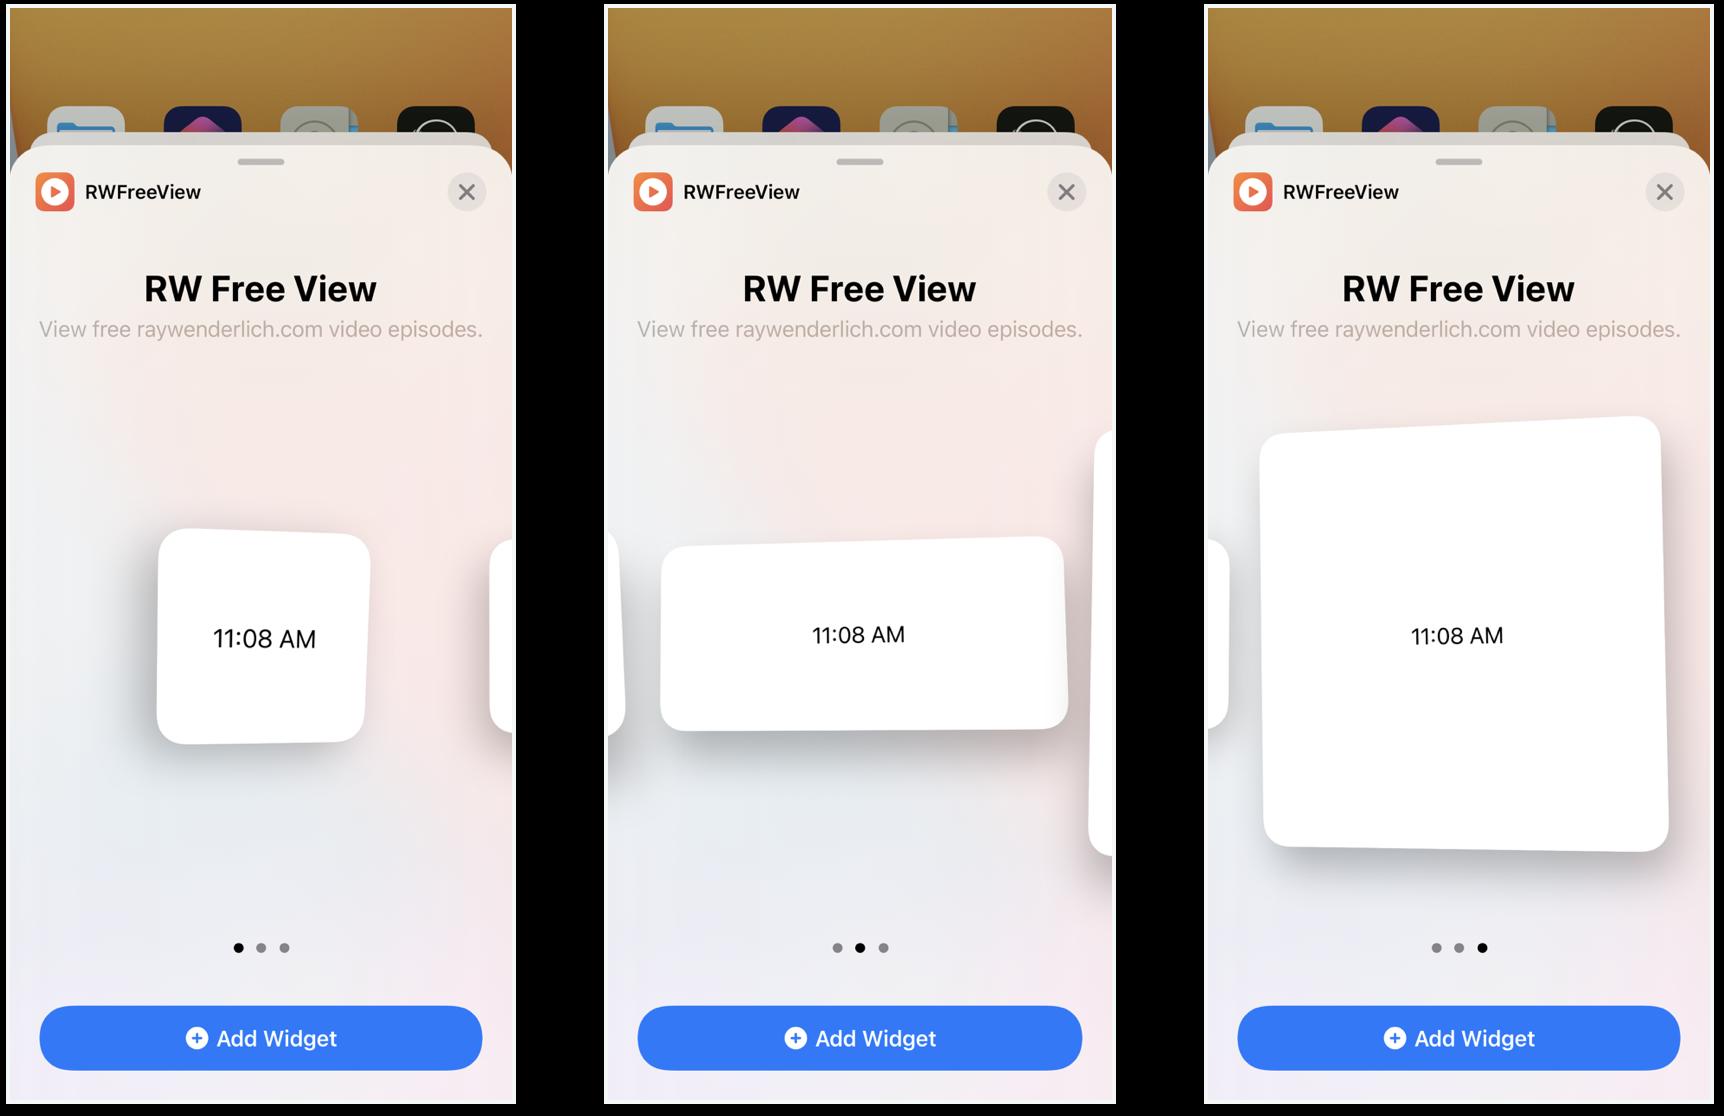 Snapshots of the three widget sizes.